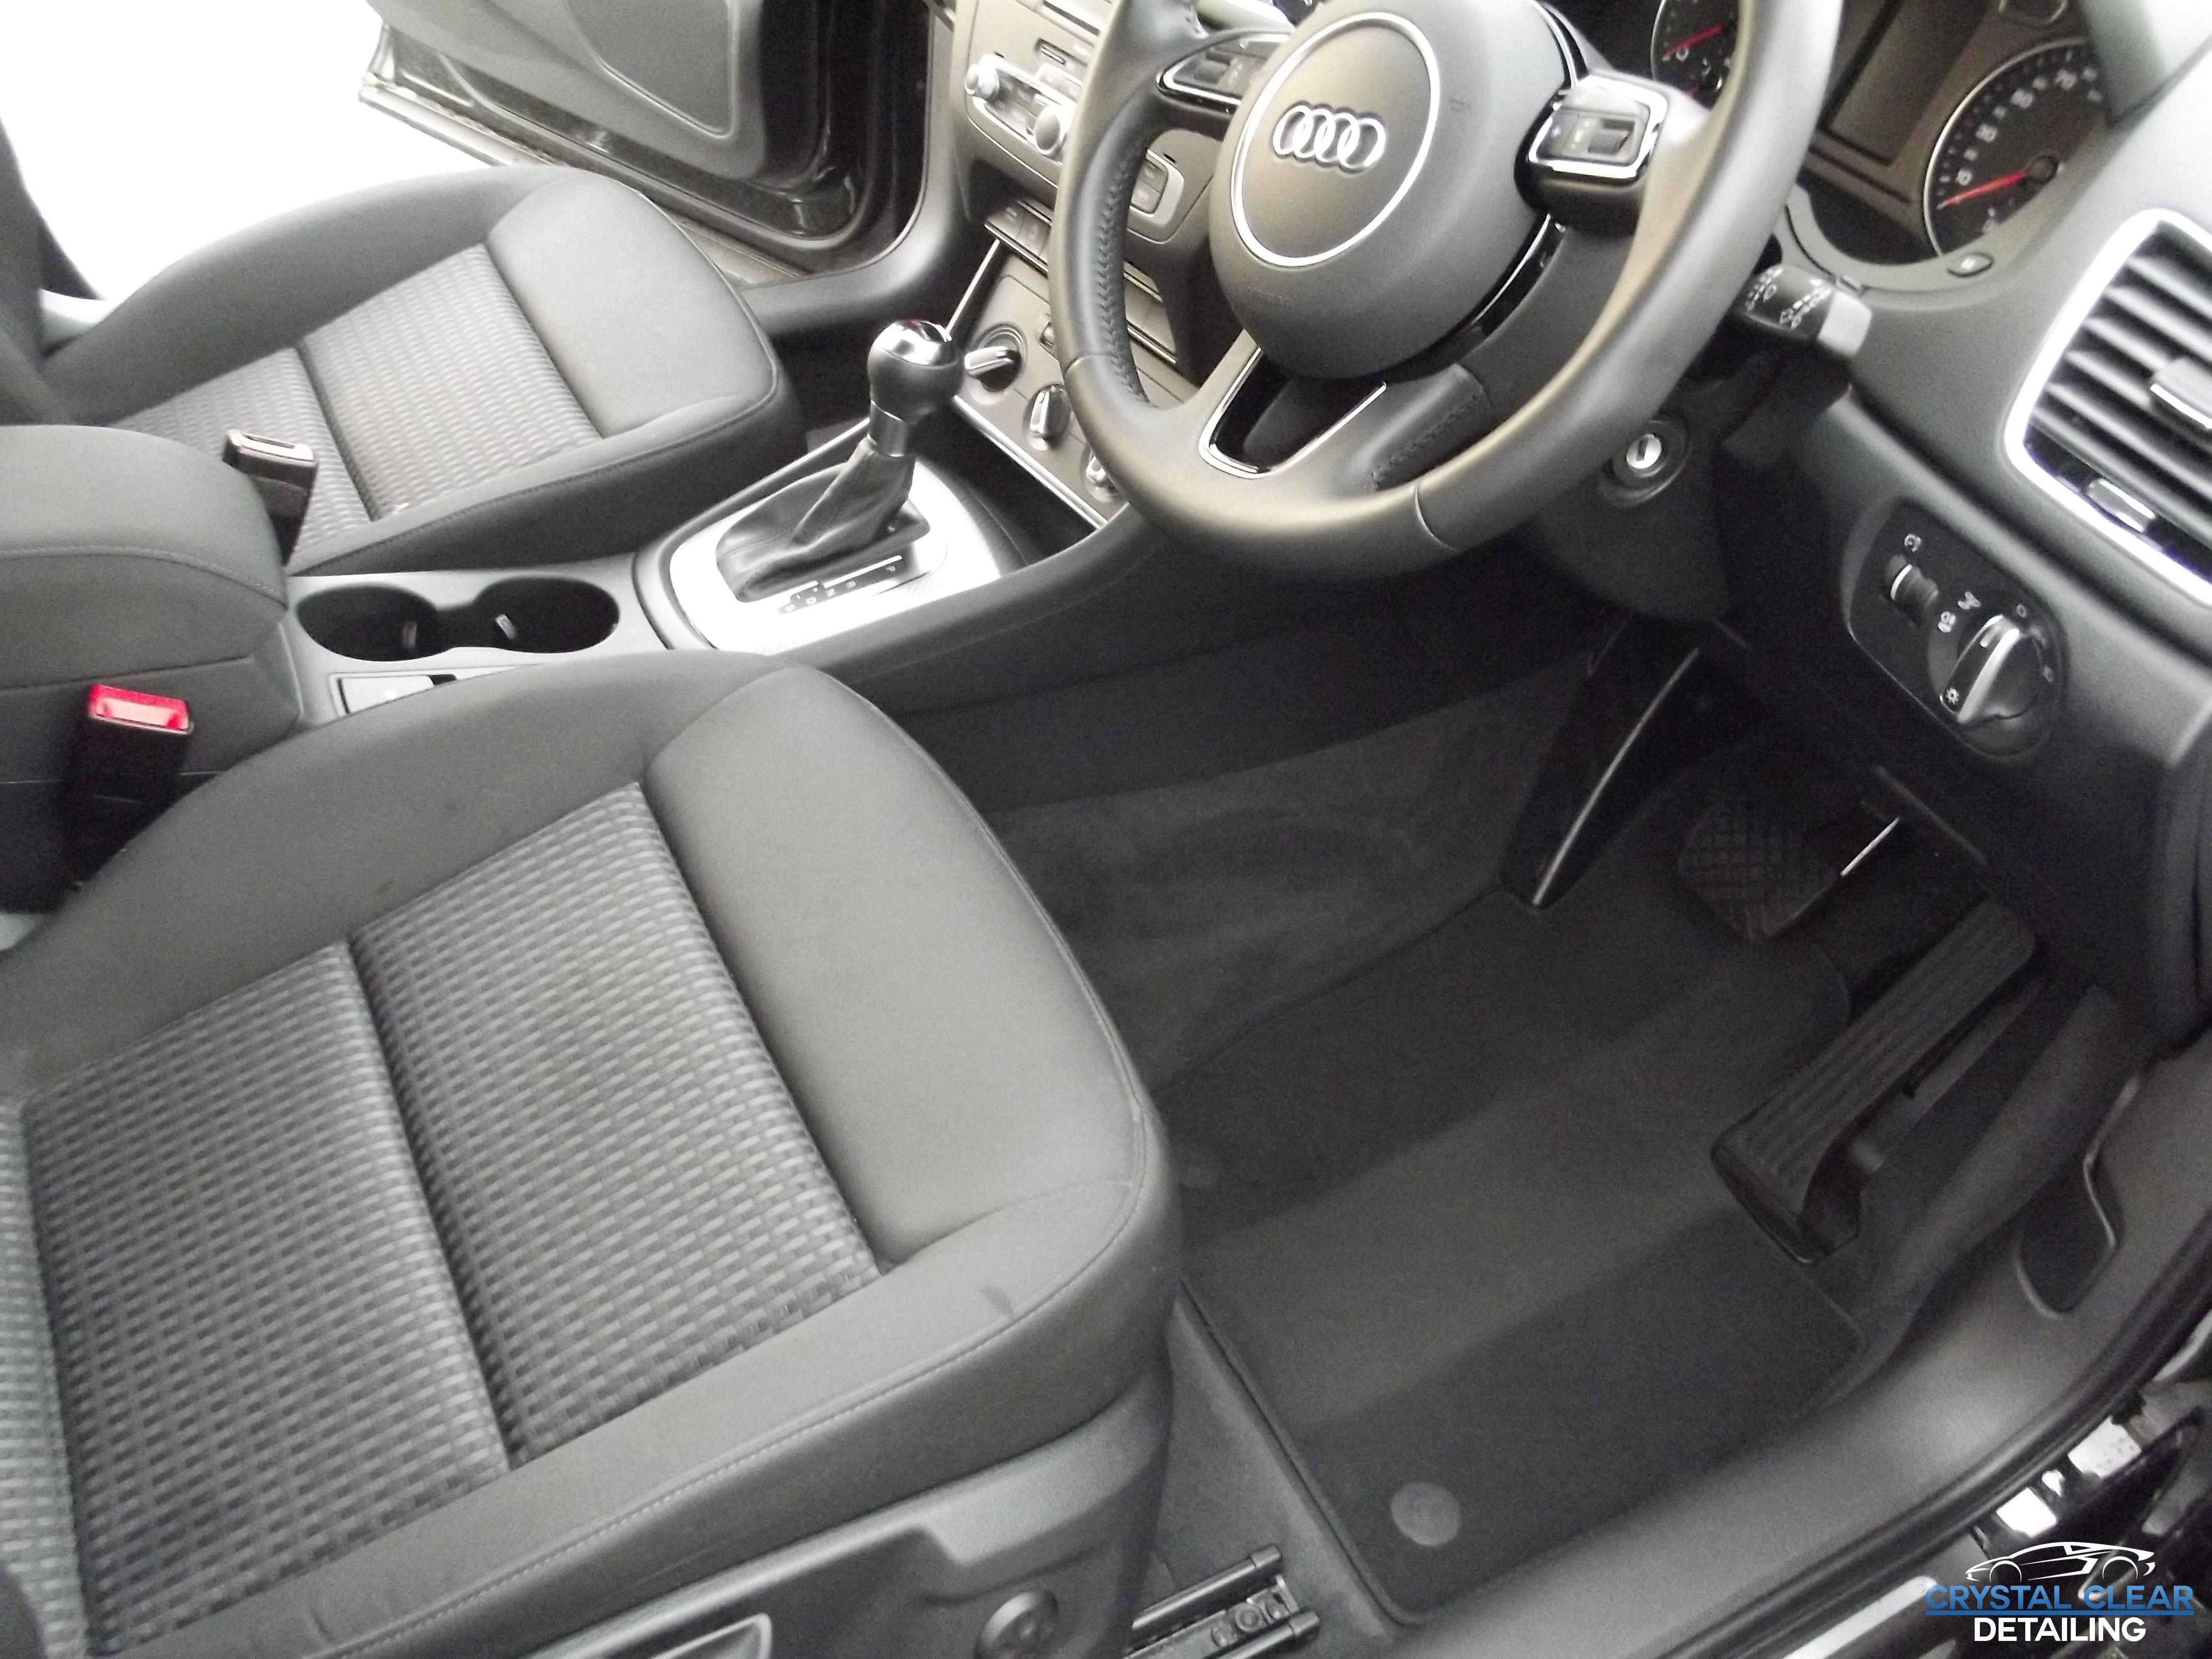 car detailing audi a6 interior detail